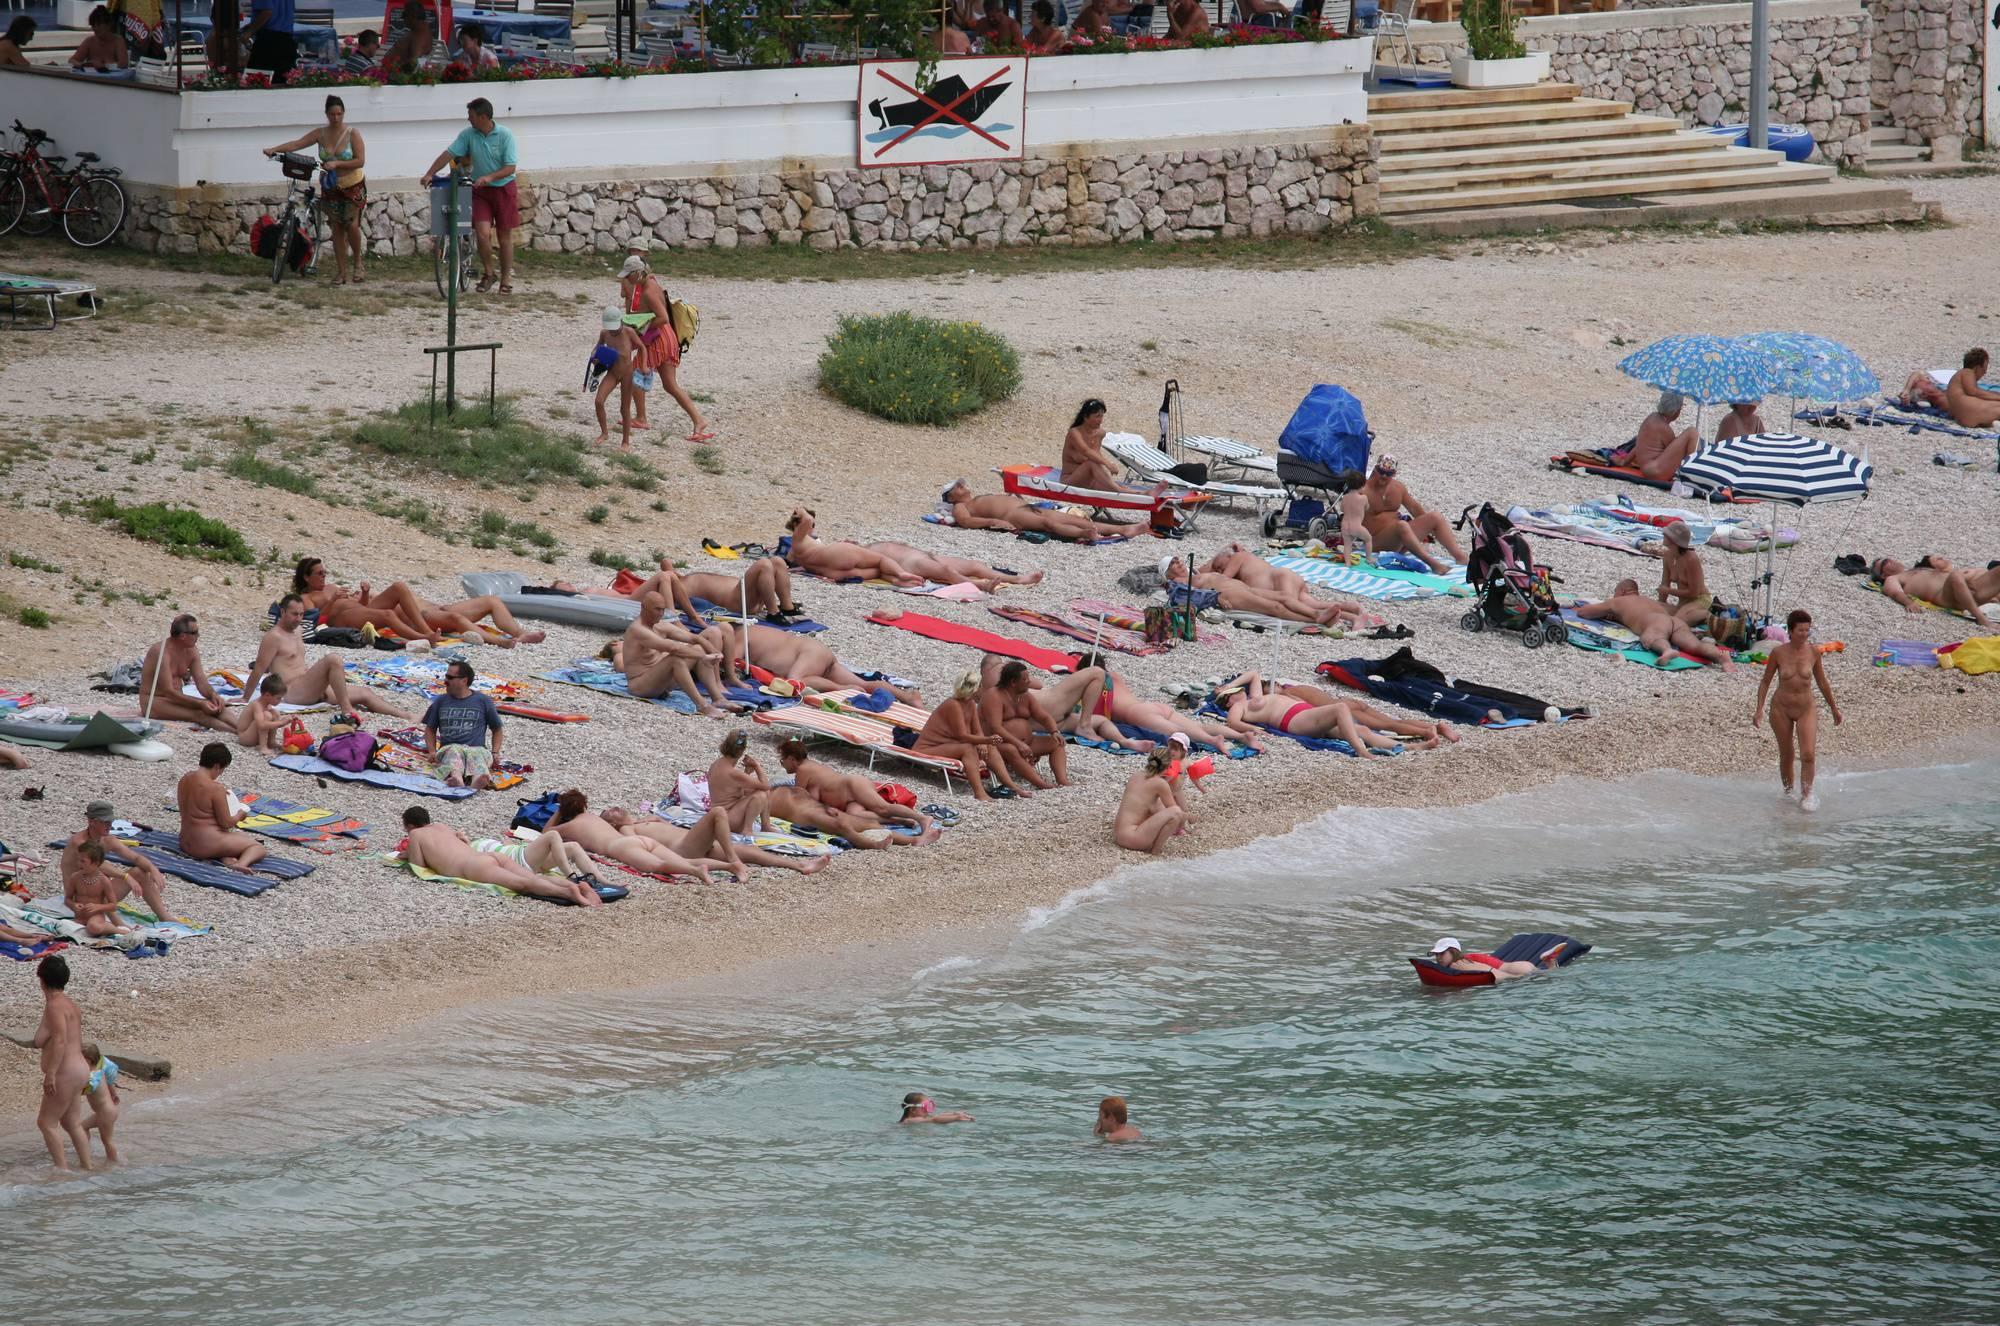 Nudist Photos Wide Maslin Beach View - 1